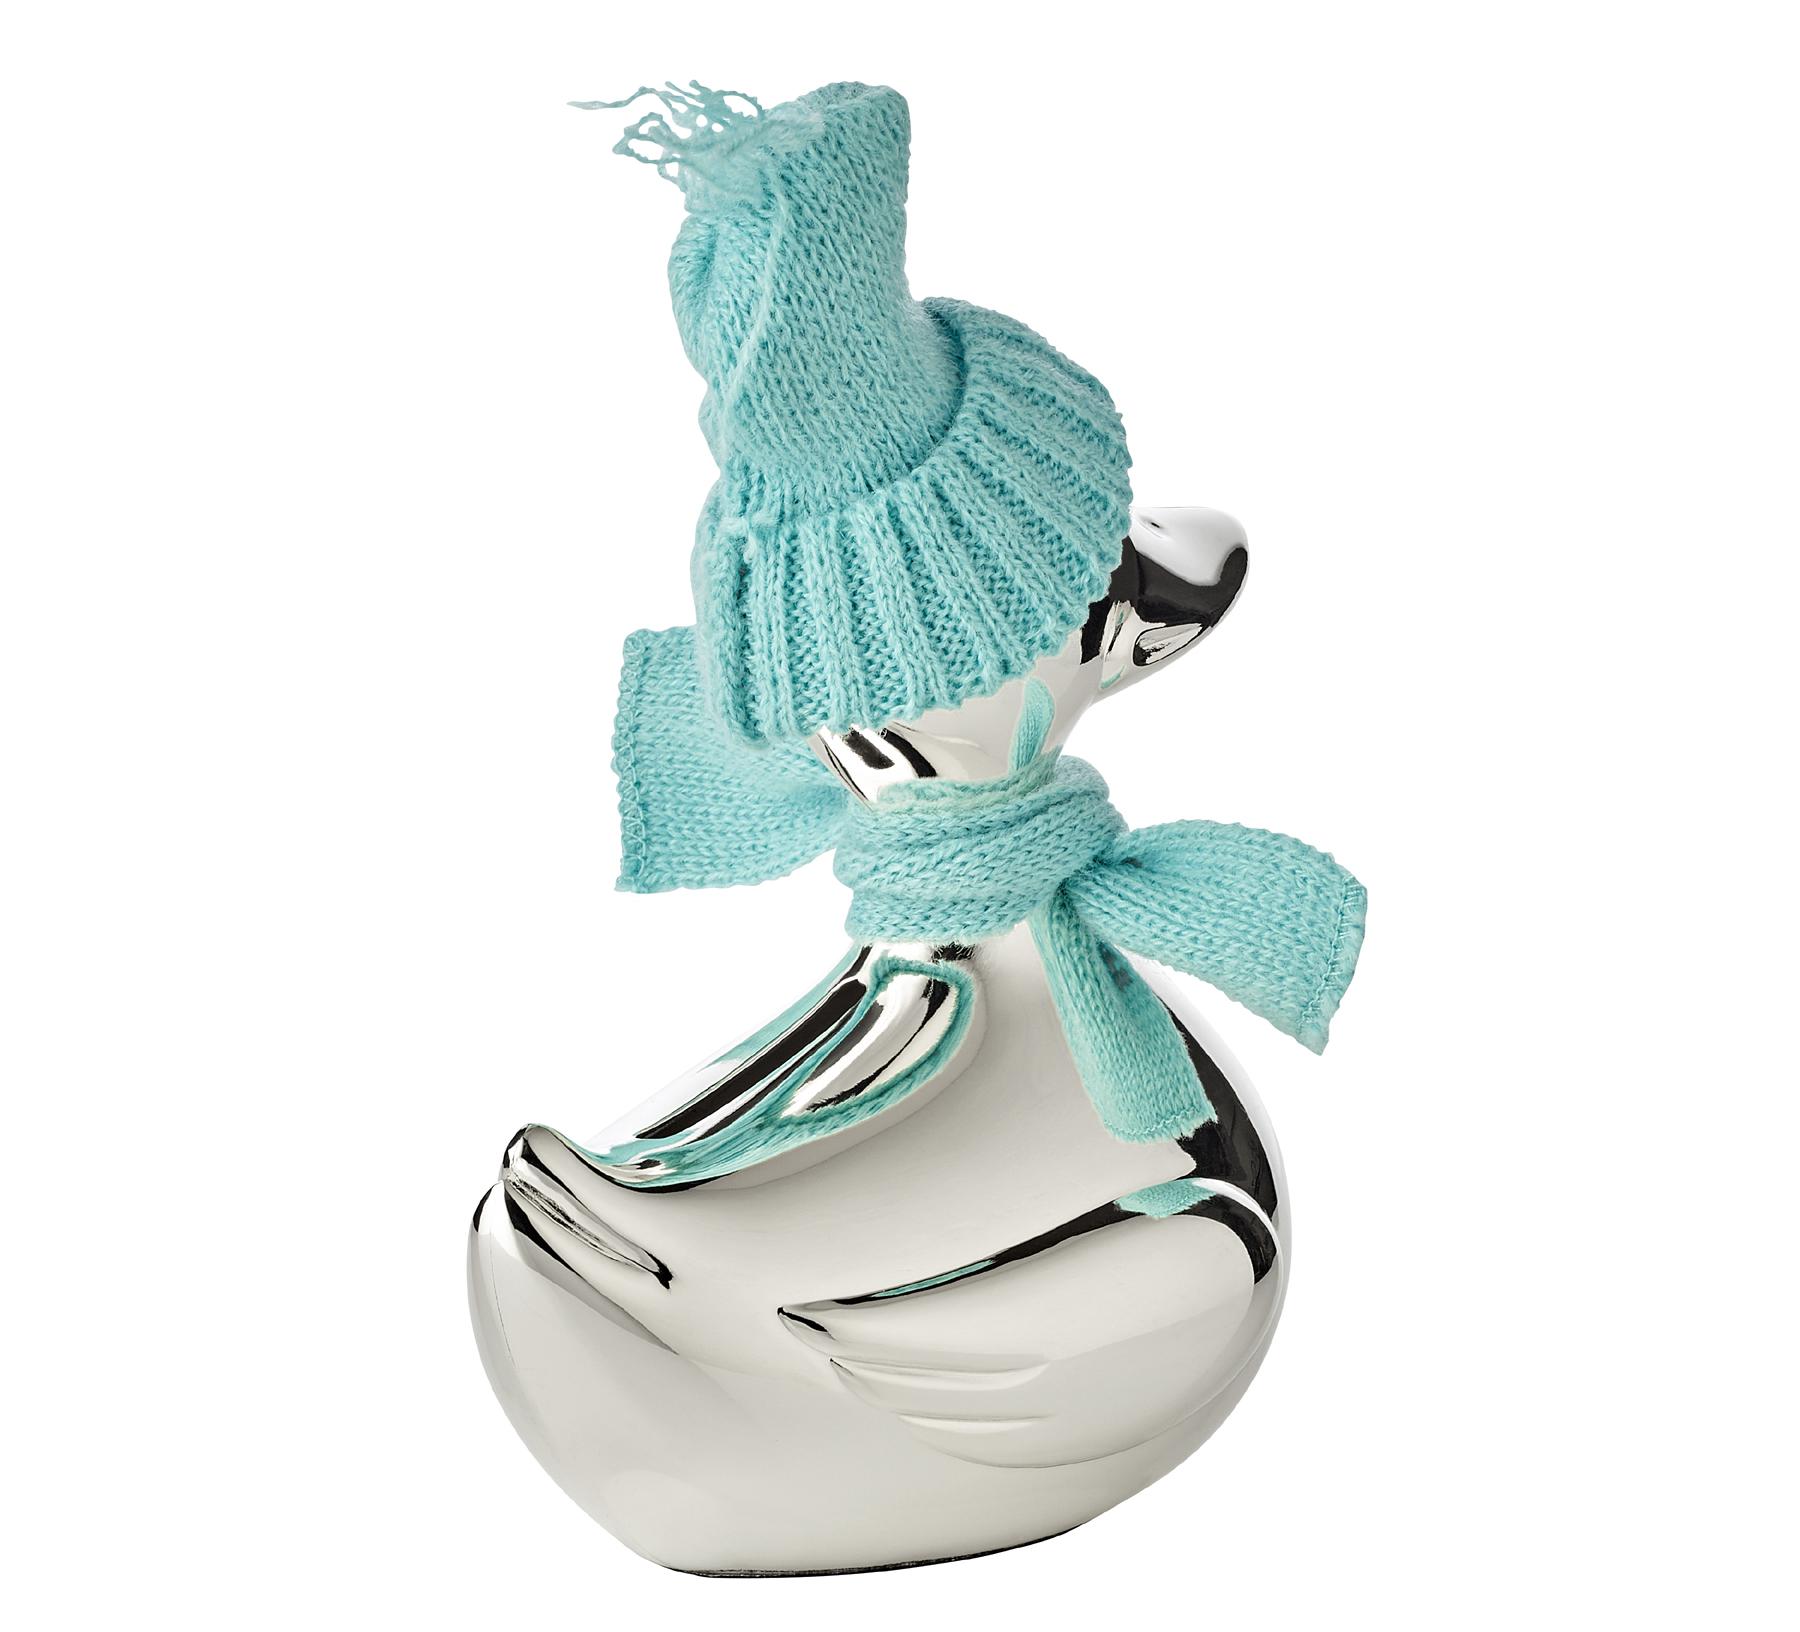 Money box piggy bank duck silver scarf cap blue pink engraving christening ebay - Engraved silver piggy bank ...